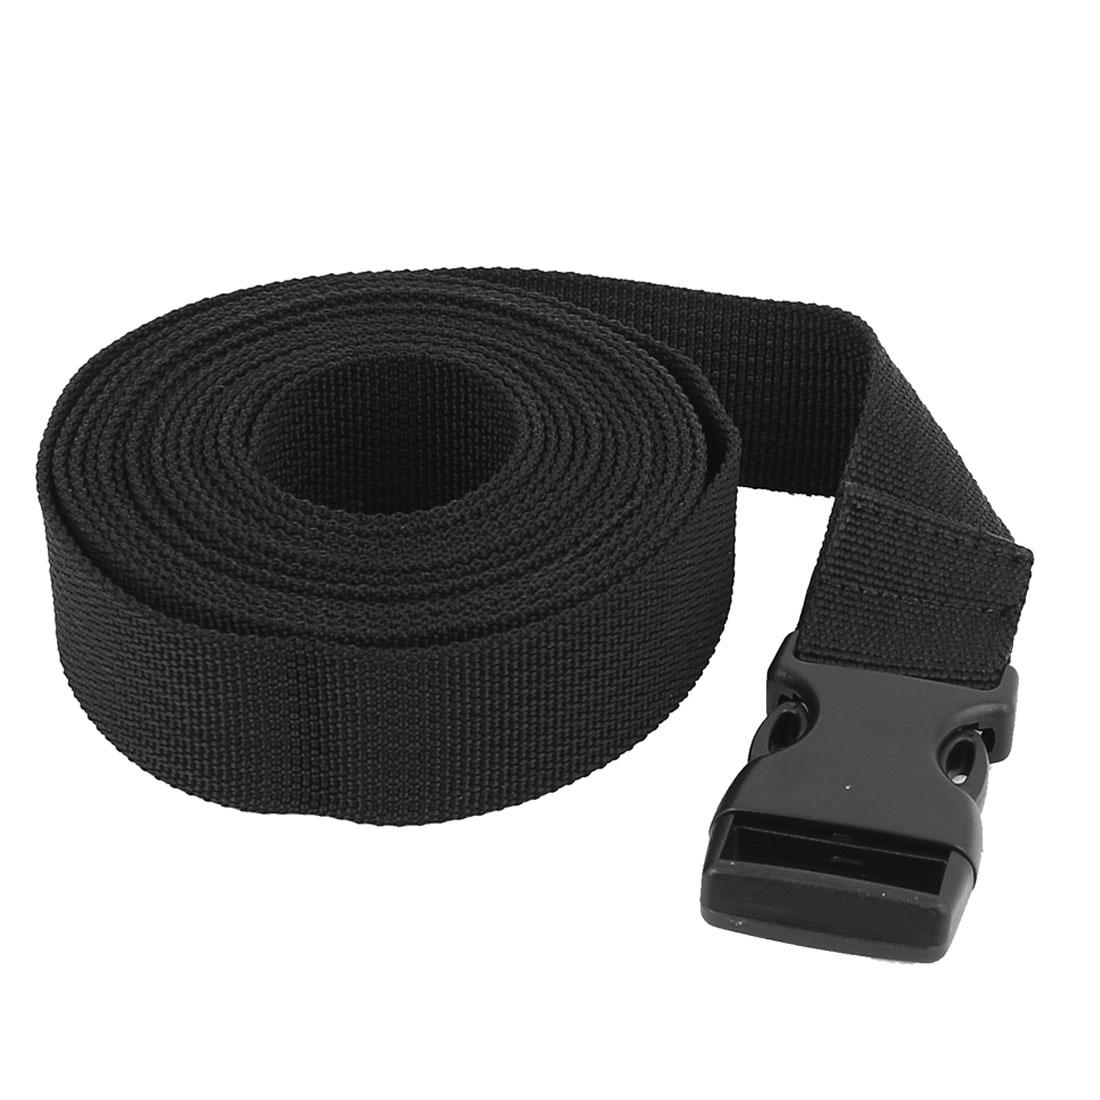 Travel Plastic Release Buckle Adjustable Luggage Backpack Packing Strap Belt Band 3Meter x 25mm